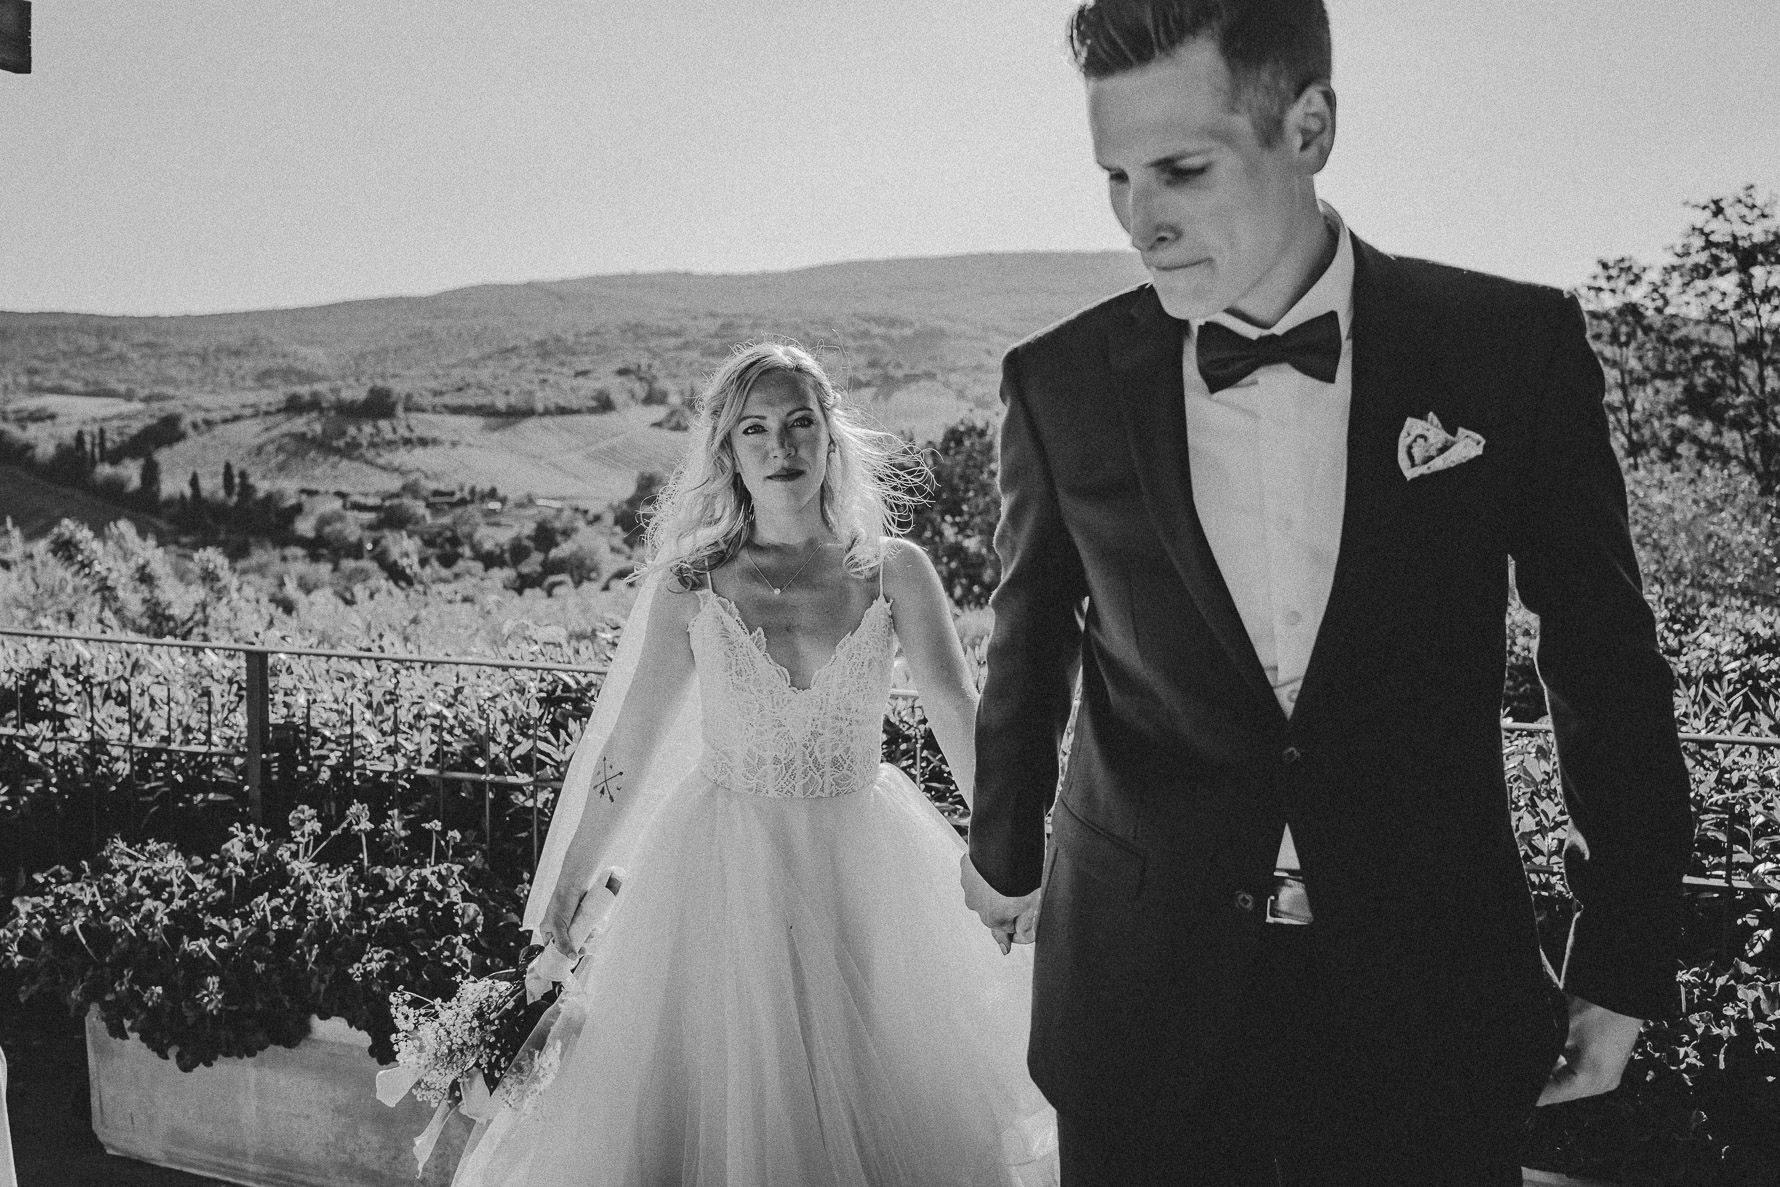 San Gimignano Wedding Photographer - Livio Lacurre Photography